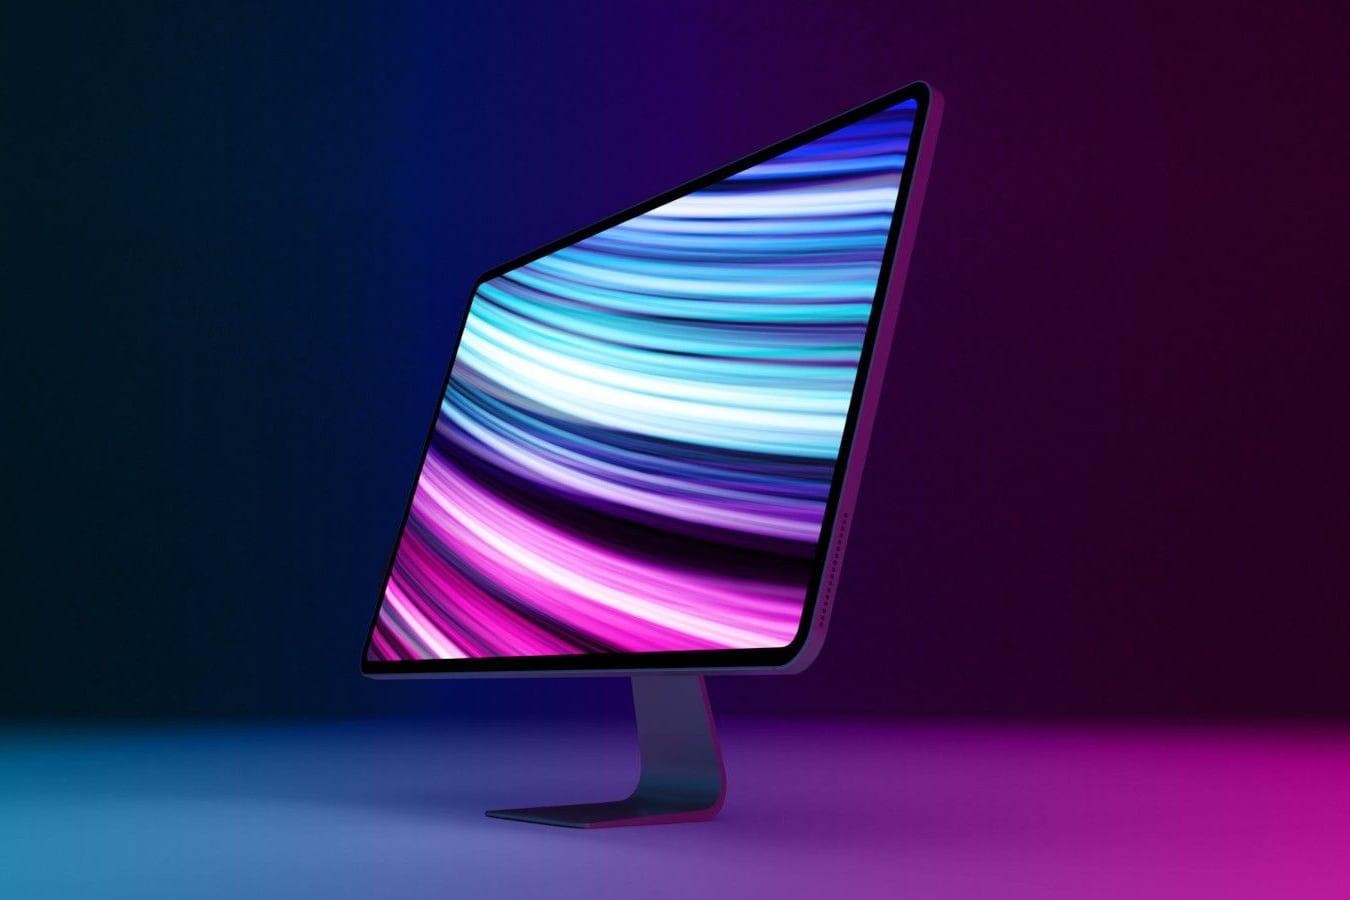 Apple выпустит MacBook Pro, iMac и Mac Pro с процессором Apple Silicon в 2021 году